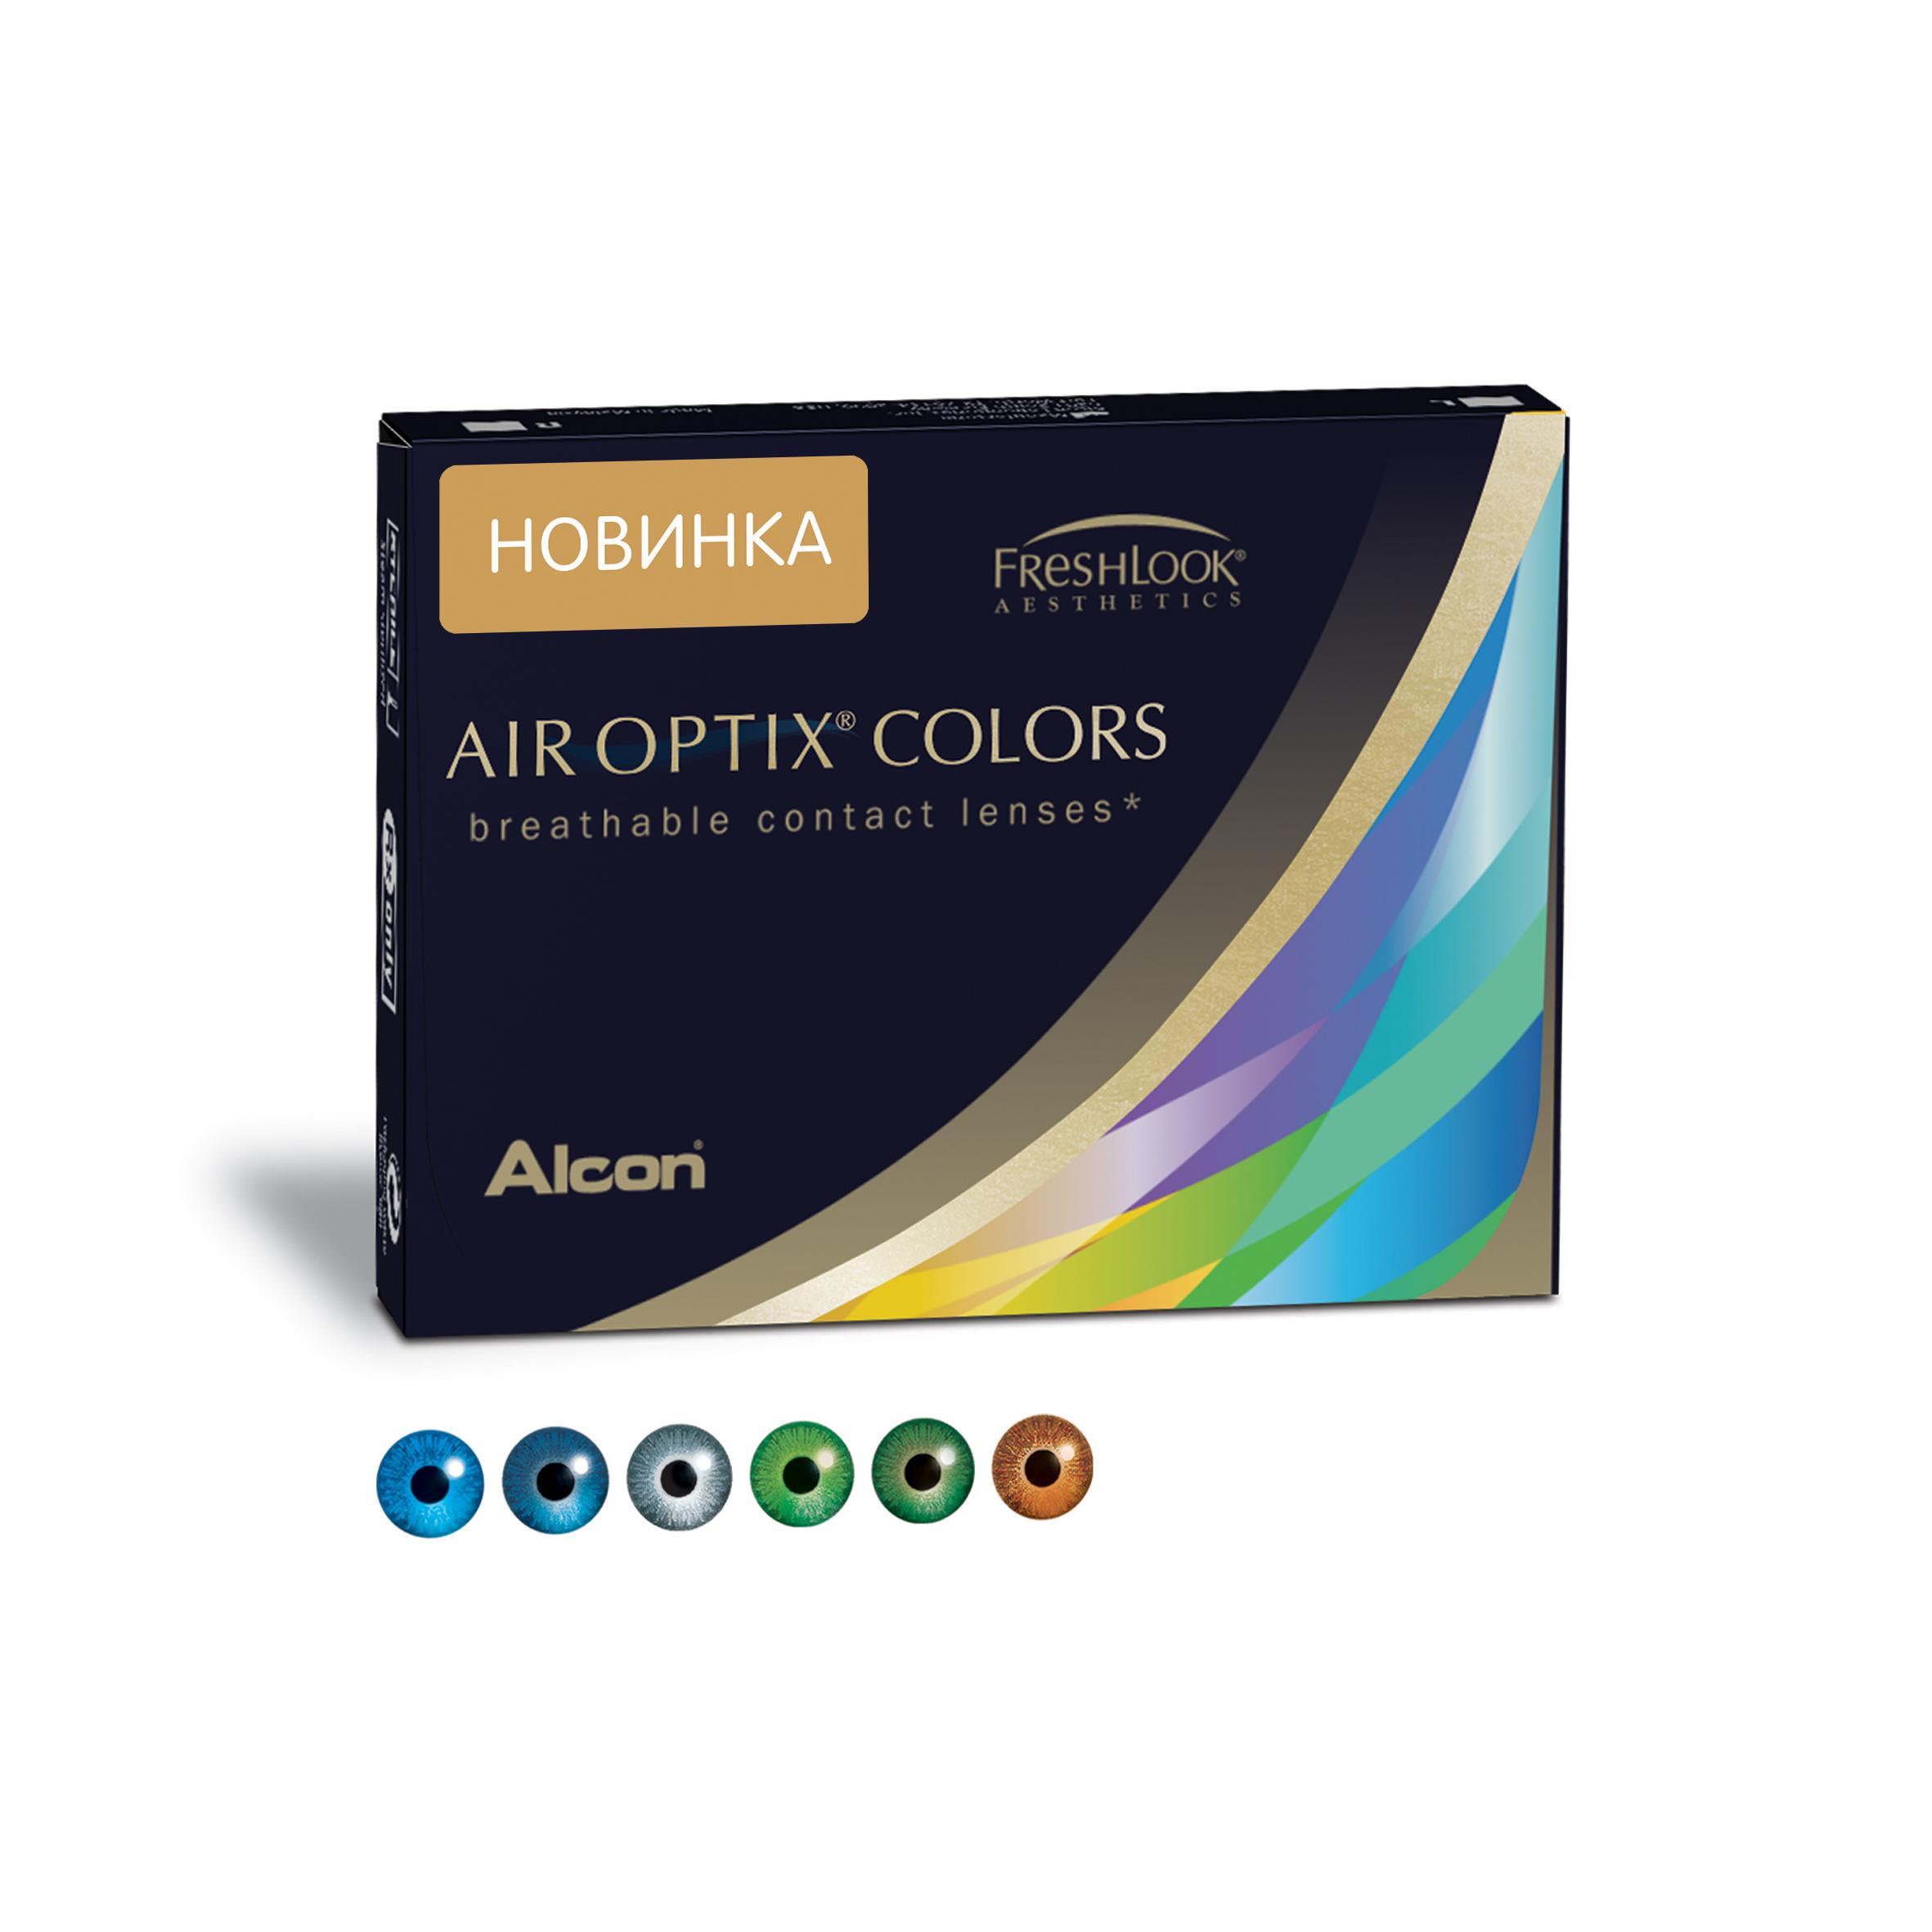 Аlcon контактные линзы Air Optix Colors 2 шт -4.75 Blue31746256Мягкие контактные линзы